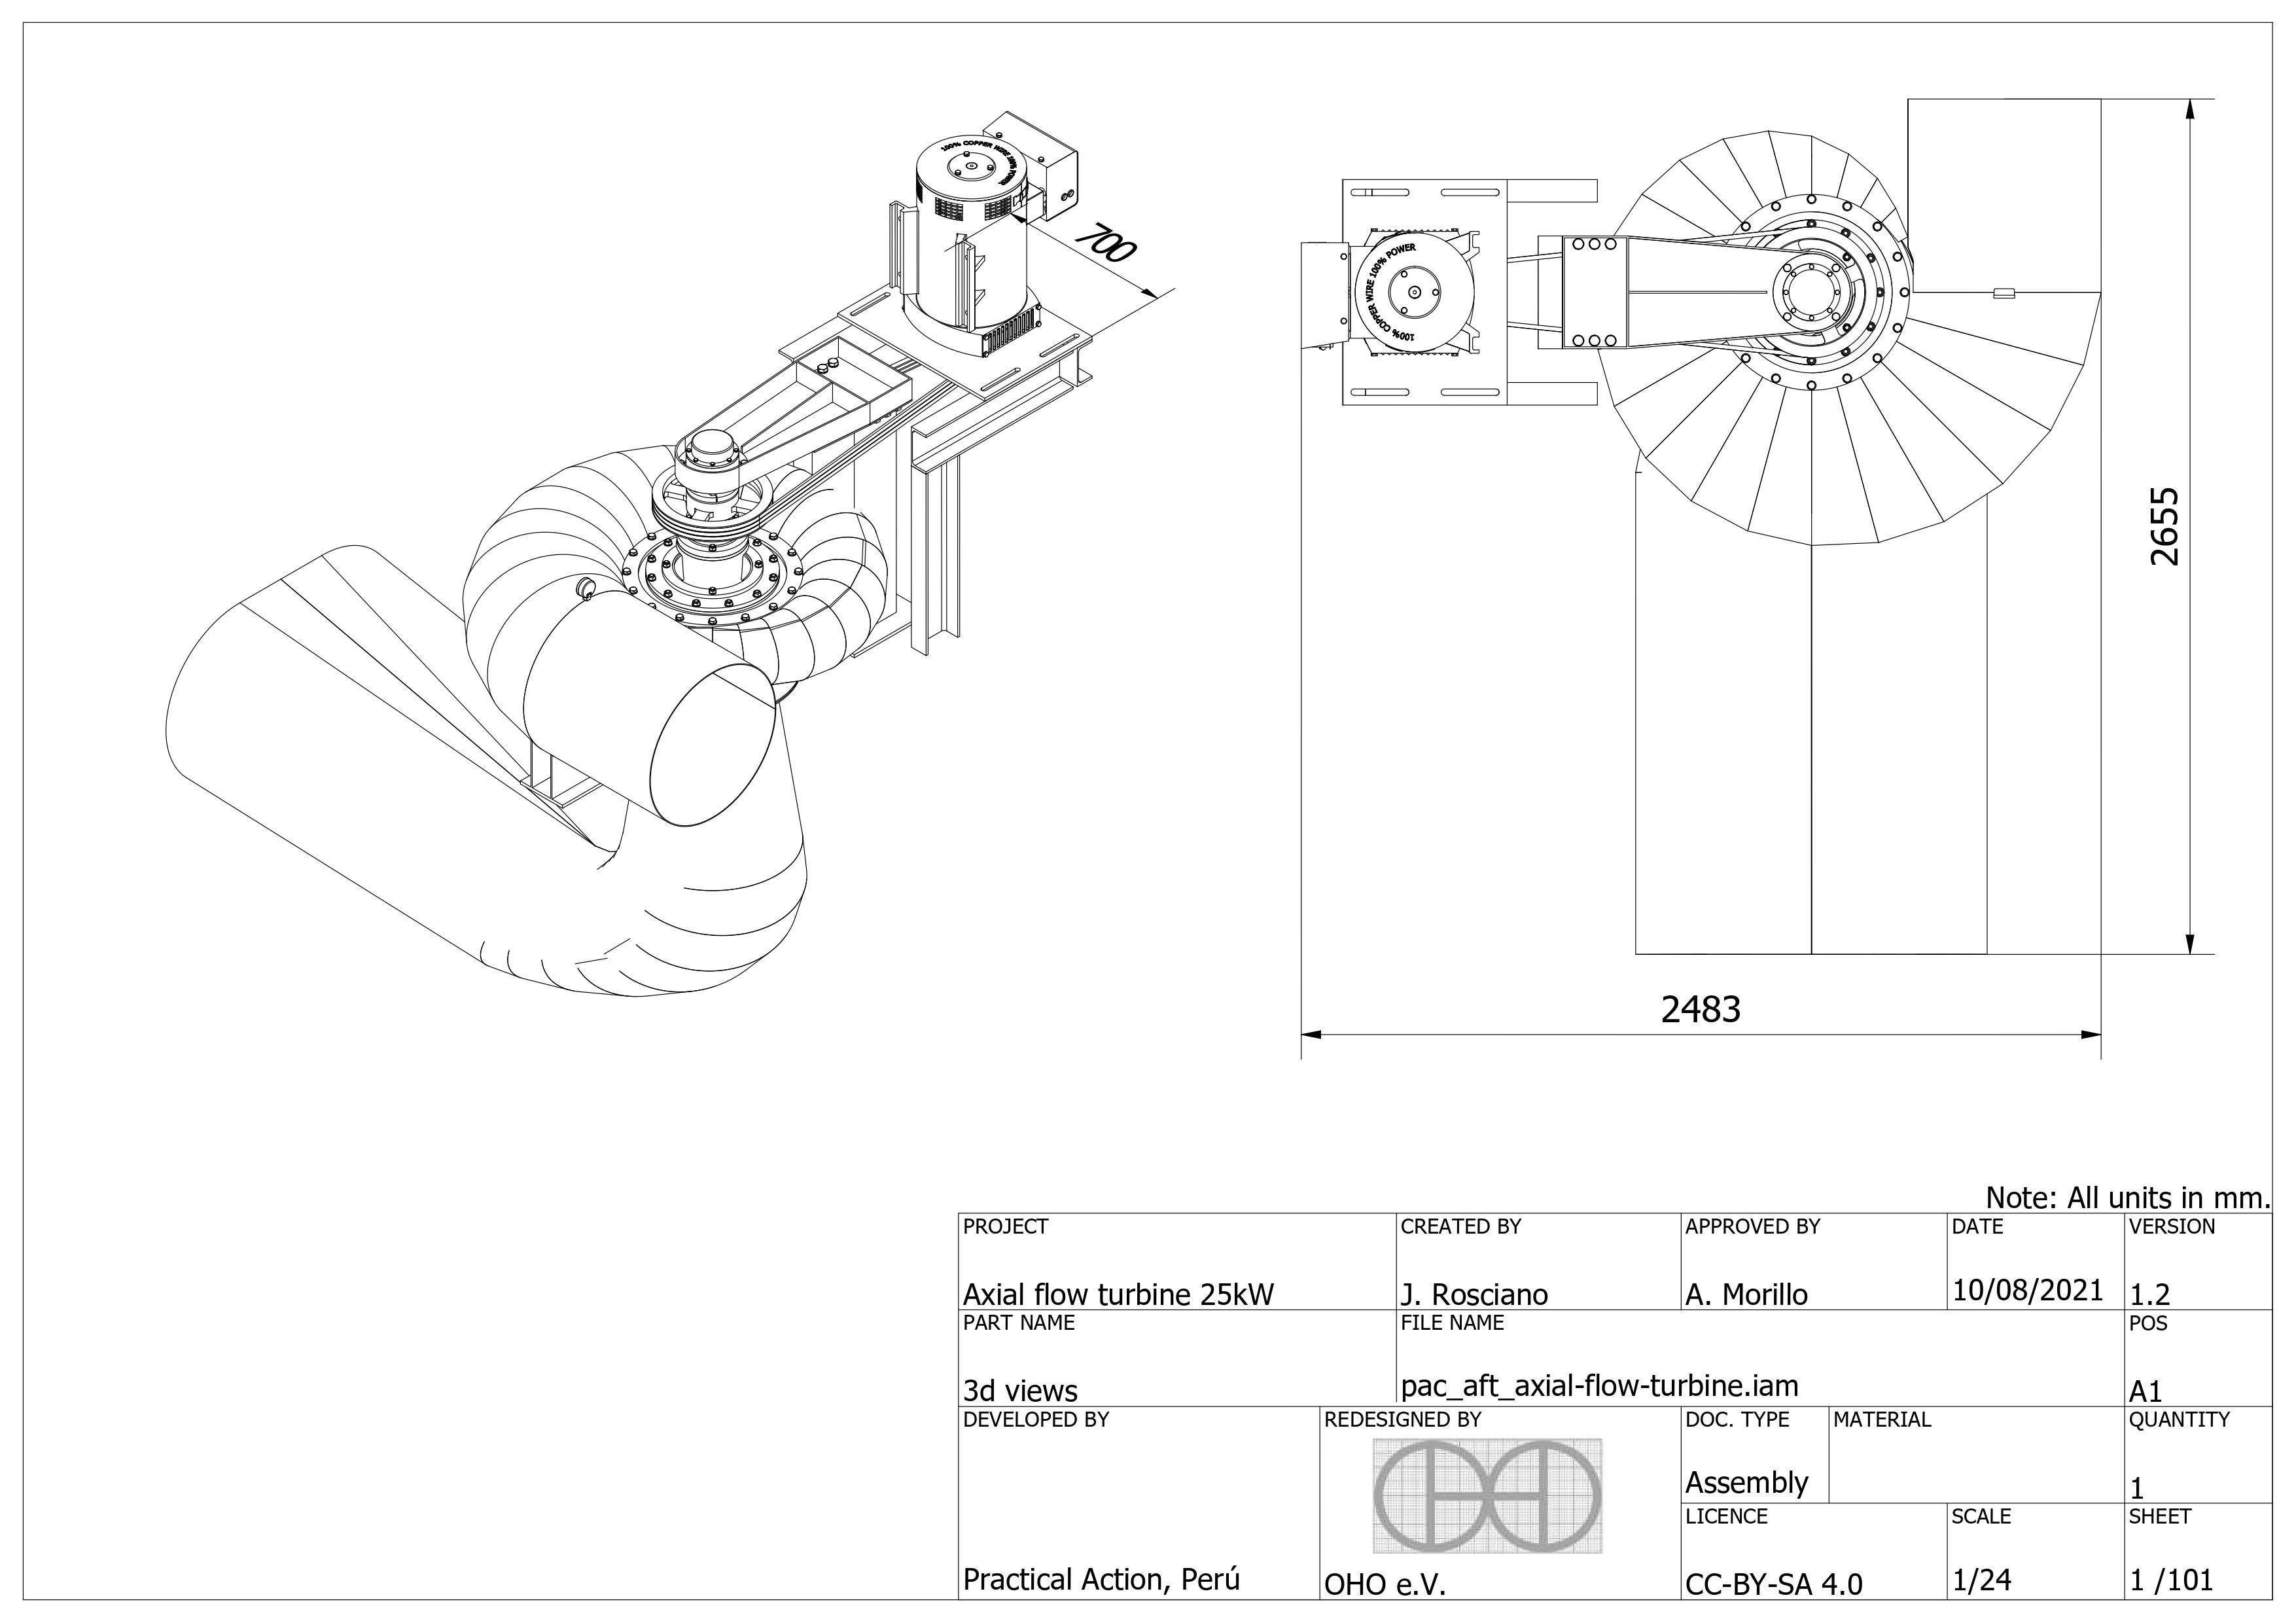 Pac aft axial-flow-turbine 0001.jpg